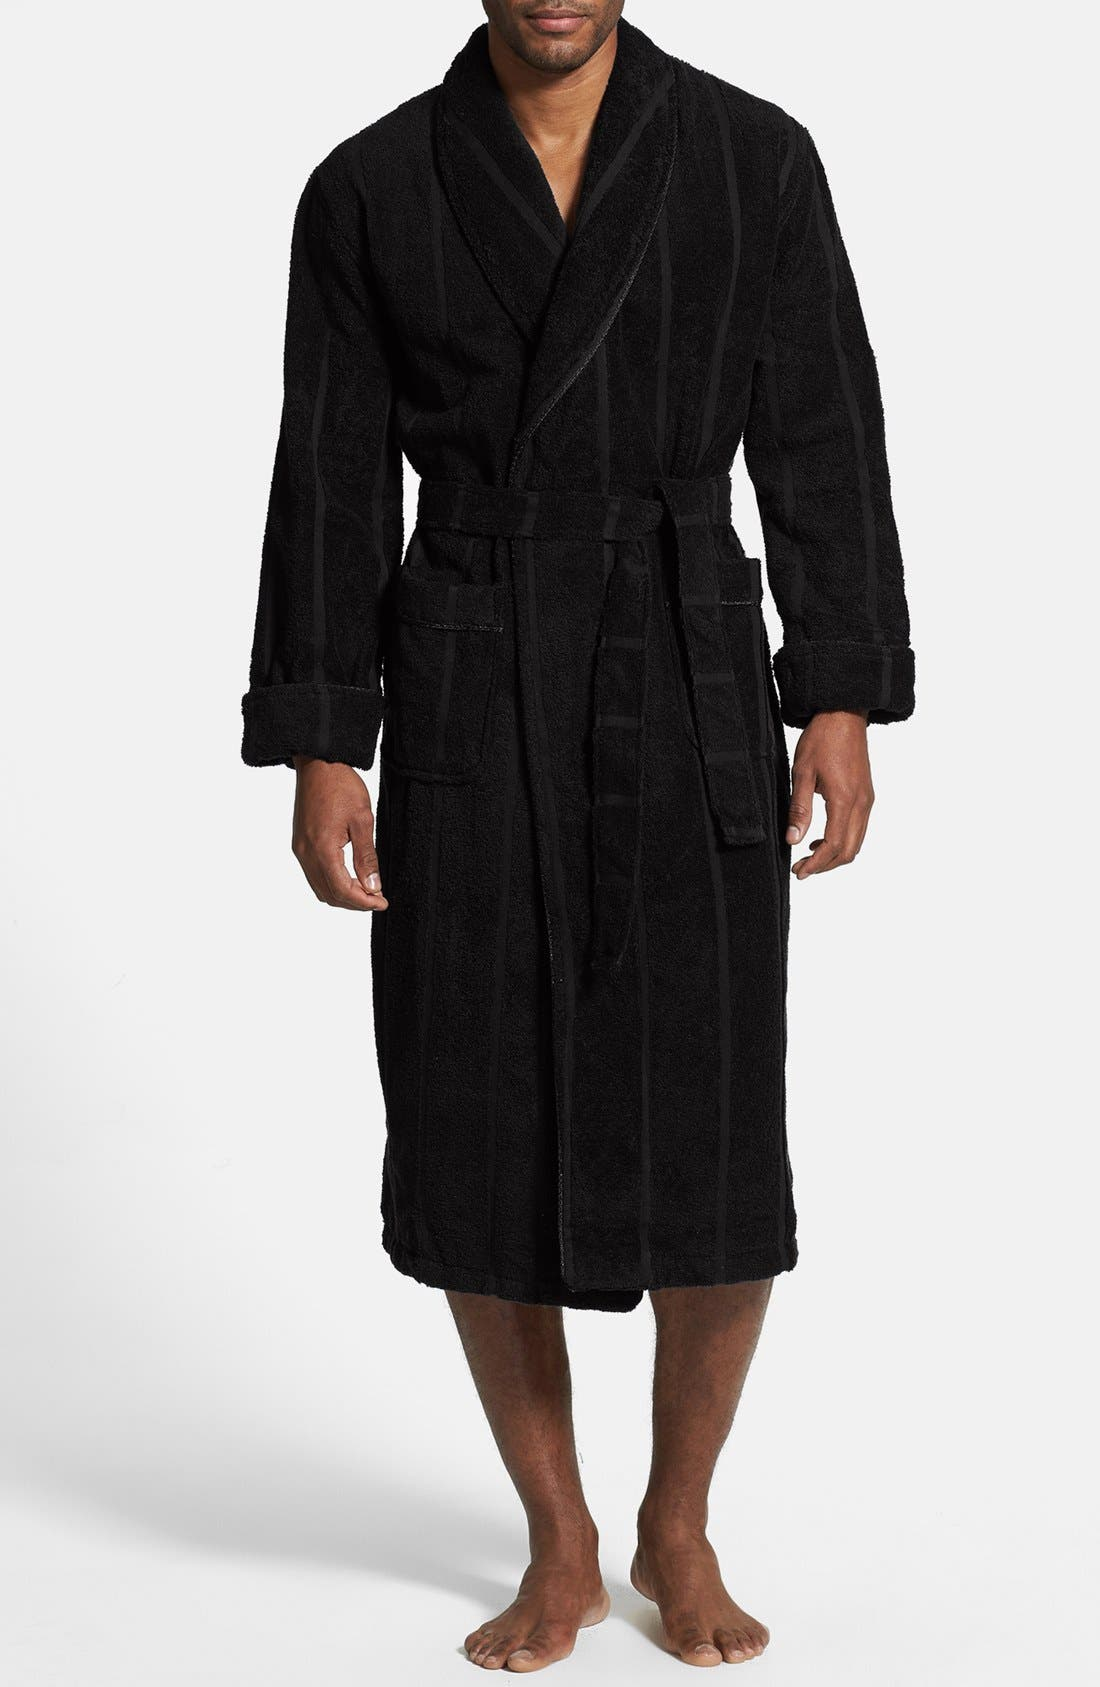 Ultra Lux Robe,                             Main thumbnail 1, color,                             BLACK